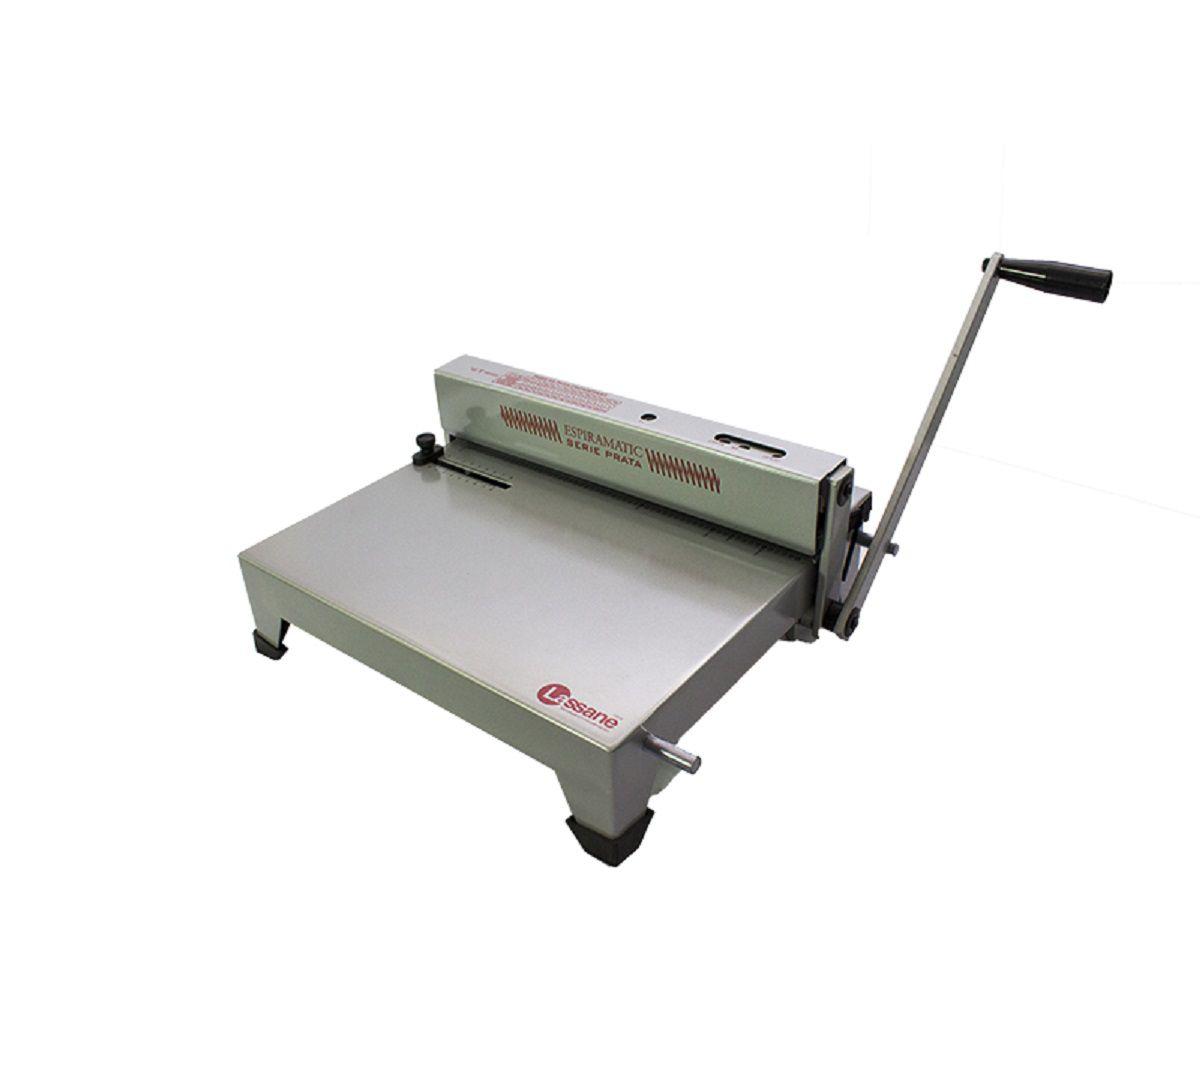 Encadernadora Perfuradora Manual Espiramatic Série Prata Lassane  - Click Suprimentos